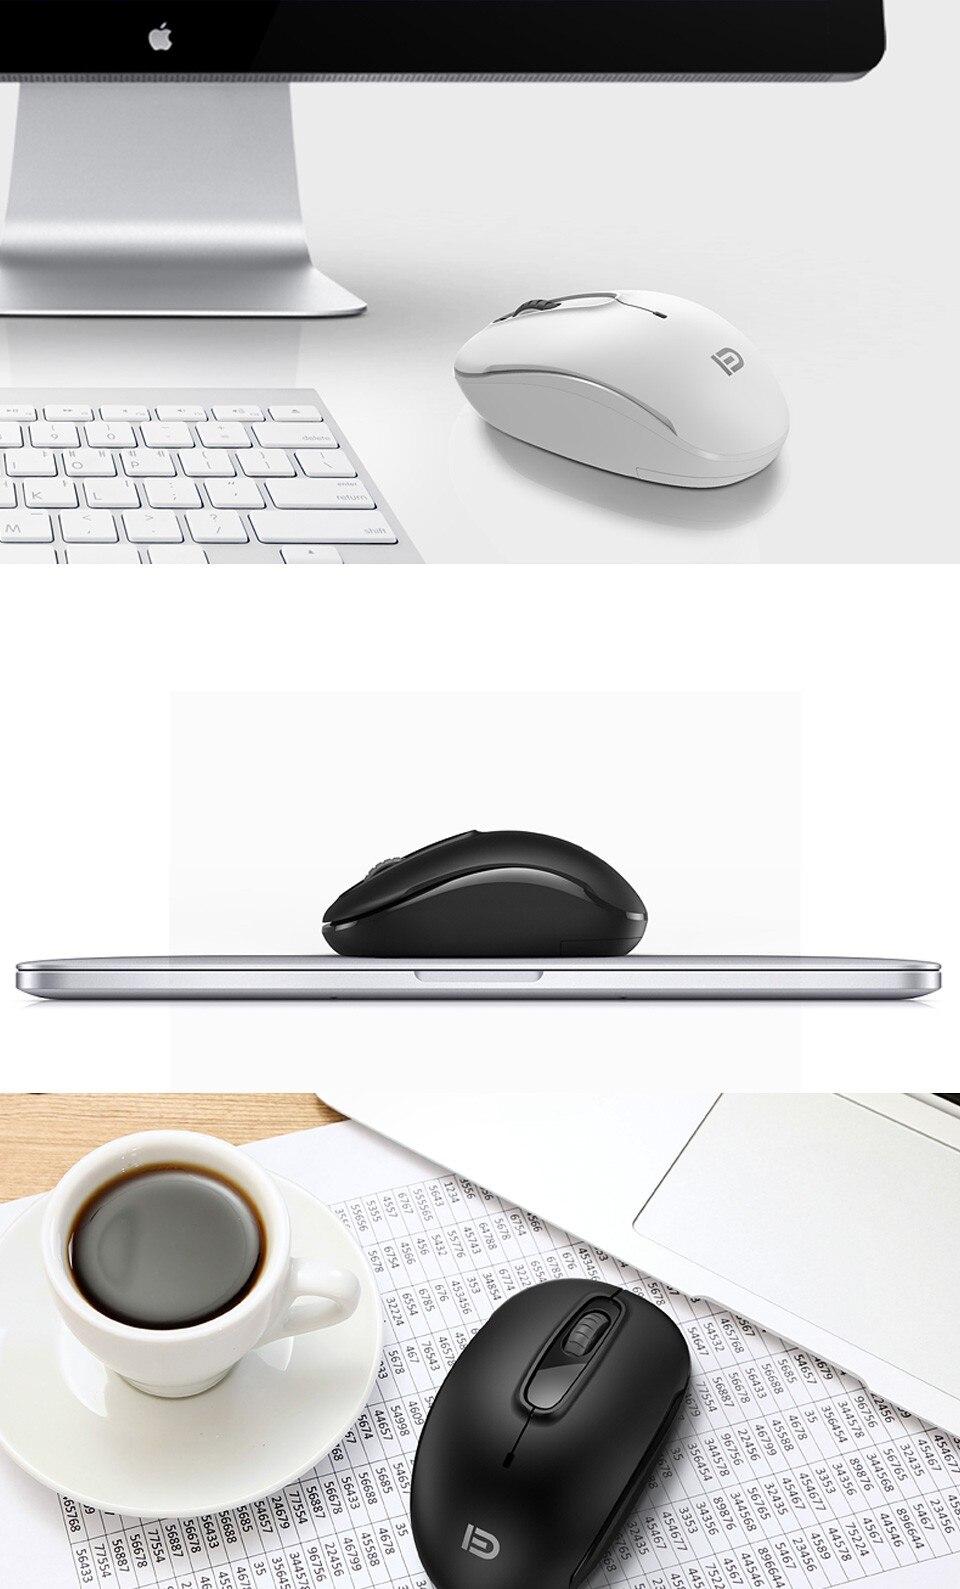 2.4Ghz Mini Portable USB Wireless Mouse 1600dpi Slient Gaming Mouse for Macbook Windows Laptop PC Computer 100% Original